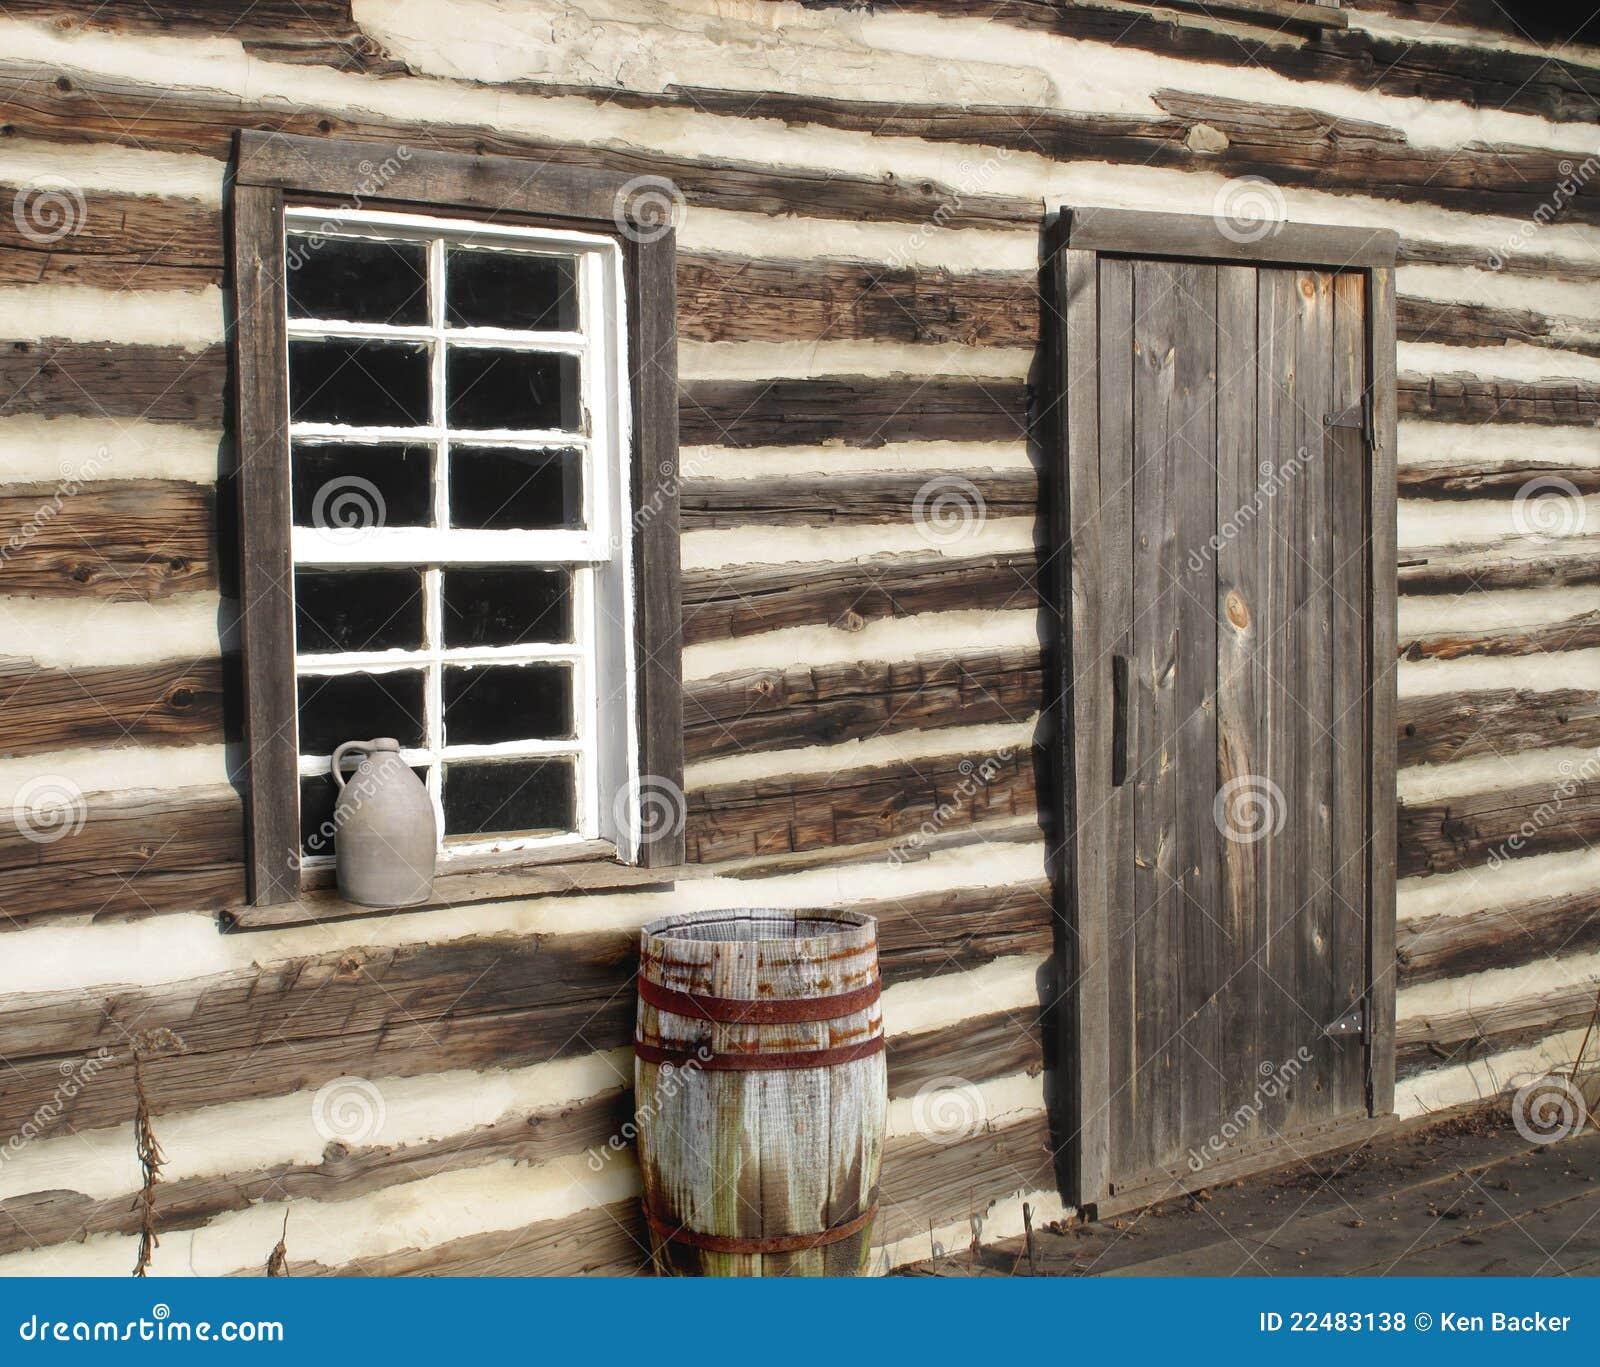 Log Cabin Door Window Close-up Royalty Free Stock Photos - Image ...